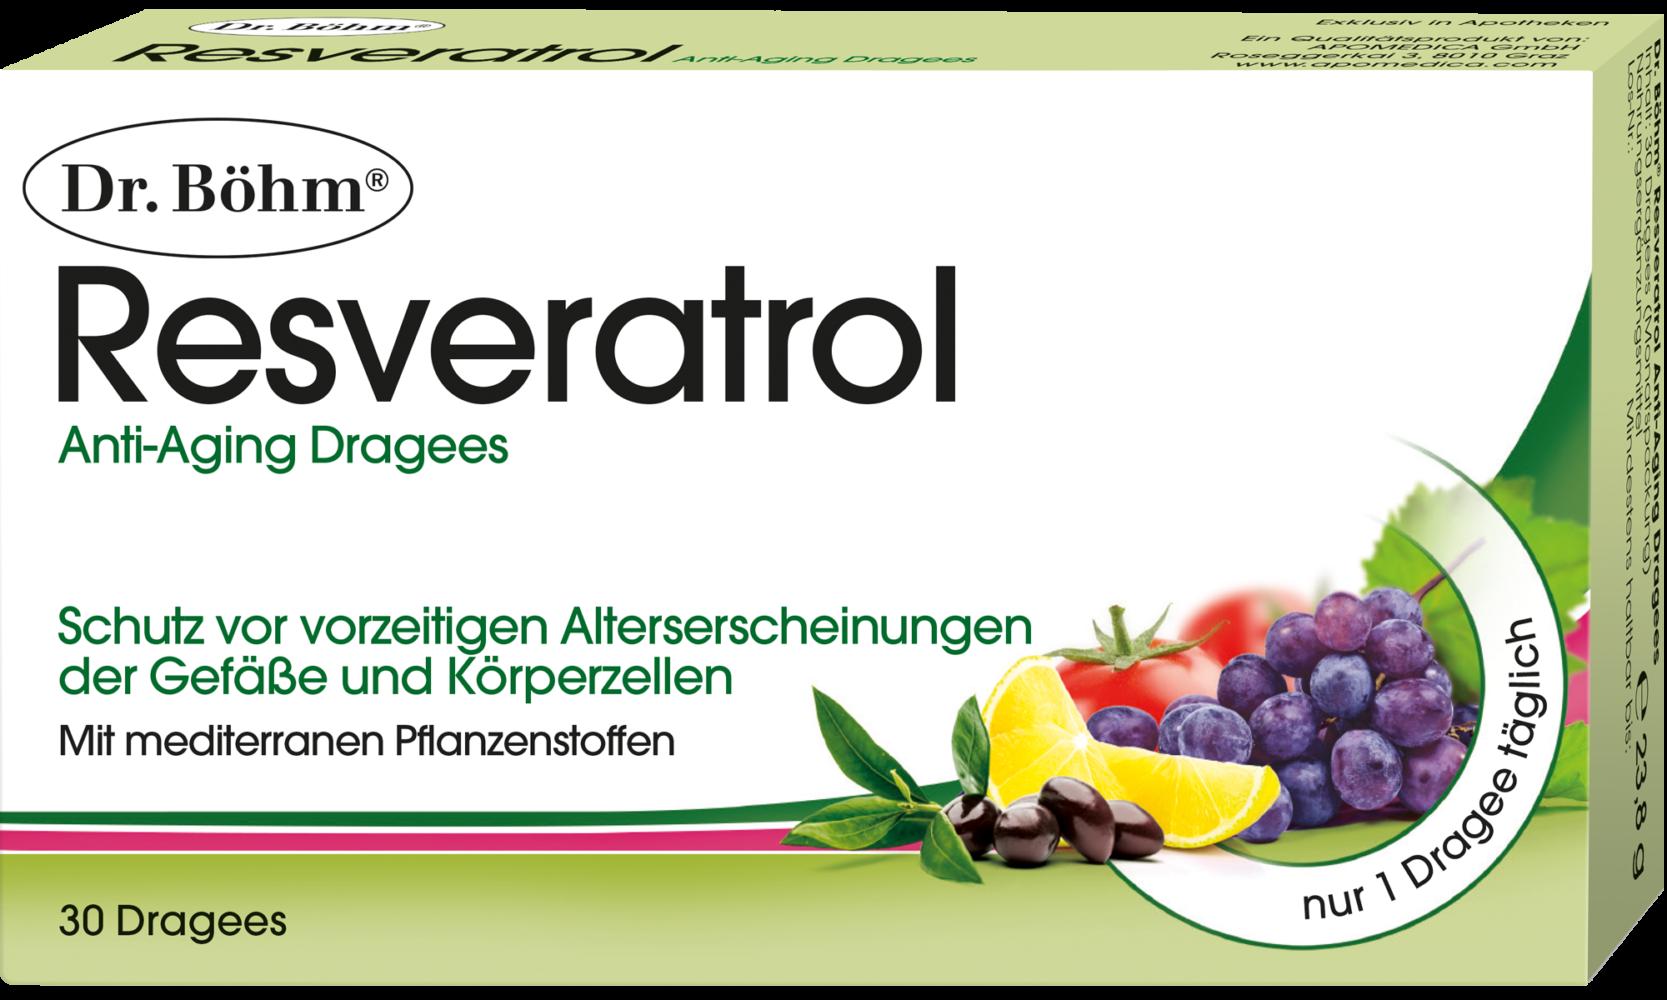 Dr. Böhm® Resveratrol Anti-Aging Dragees